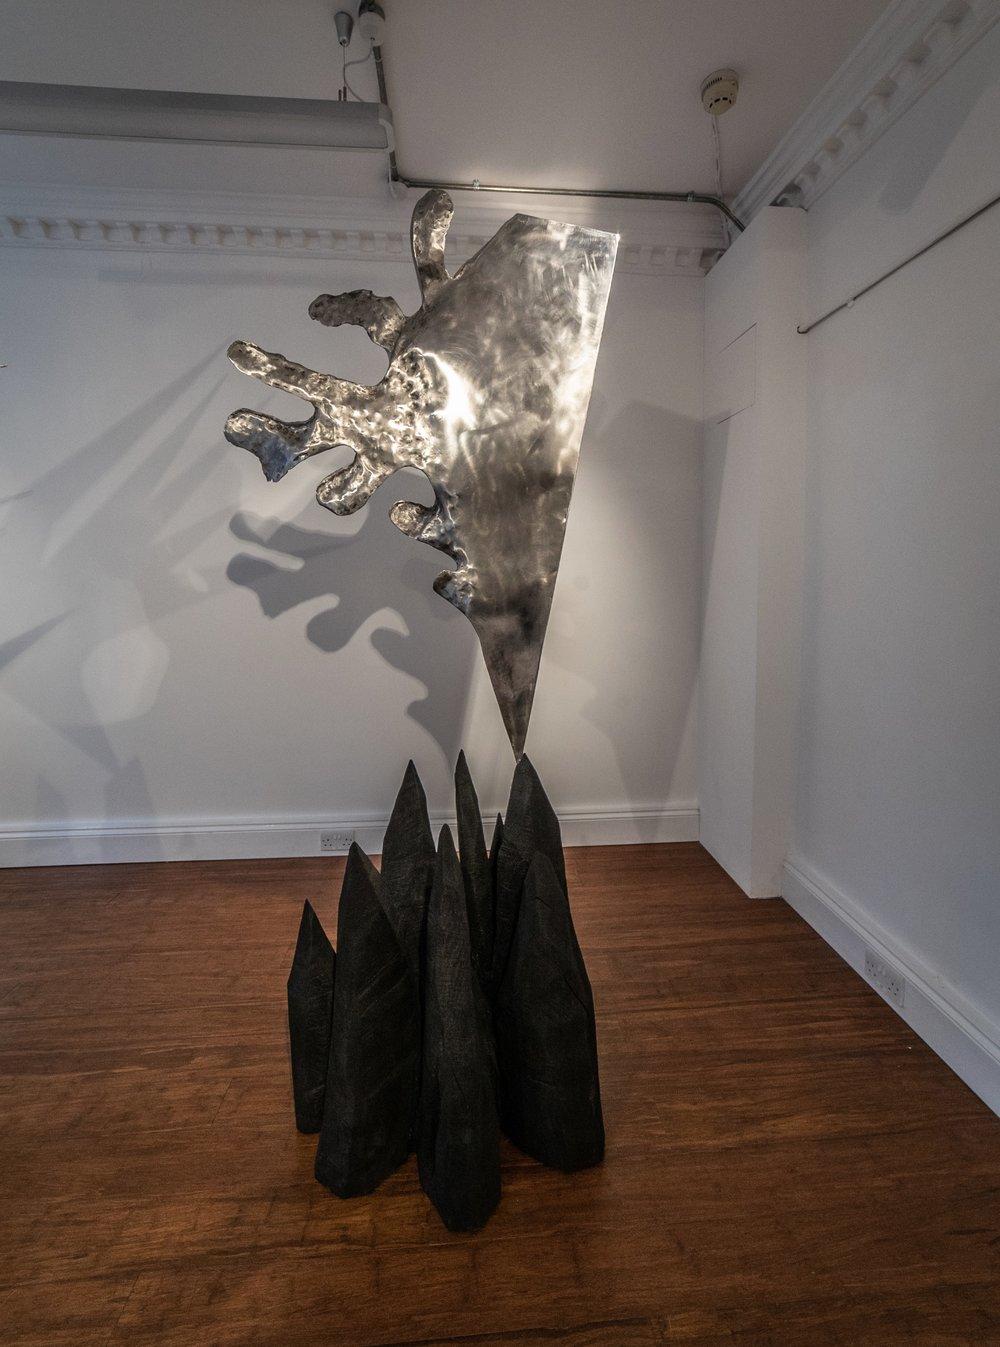 Sol Bailey-Barker  Caldera , 2018 Charred Oak & Stainless Steel 226 cm x 102 cm x 64 cm